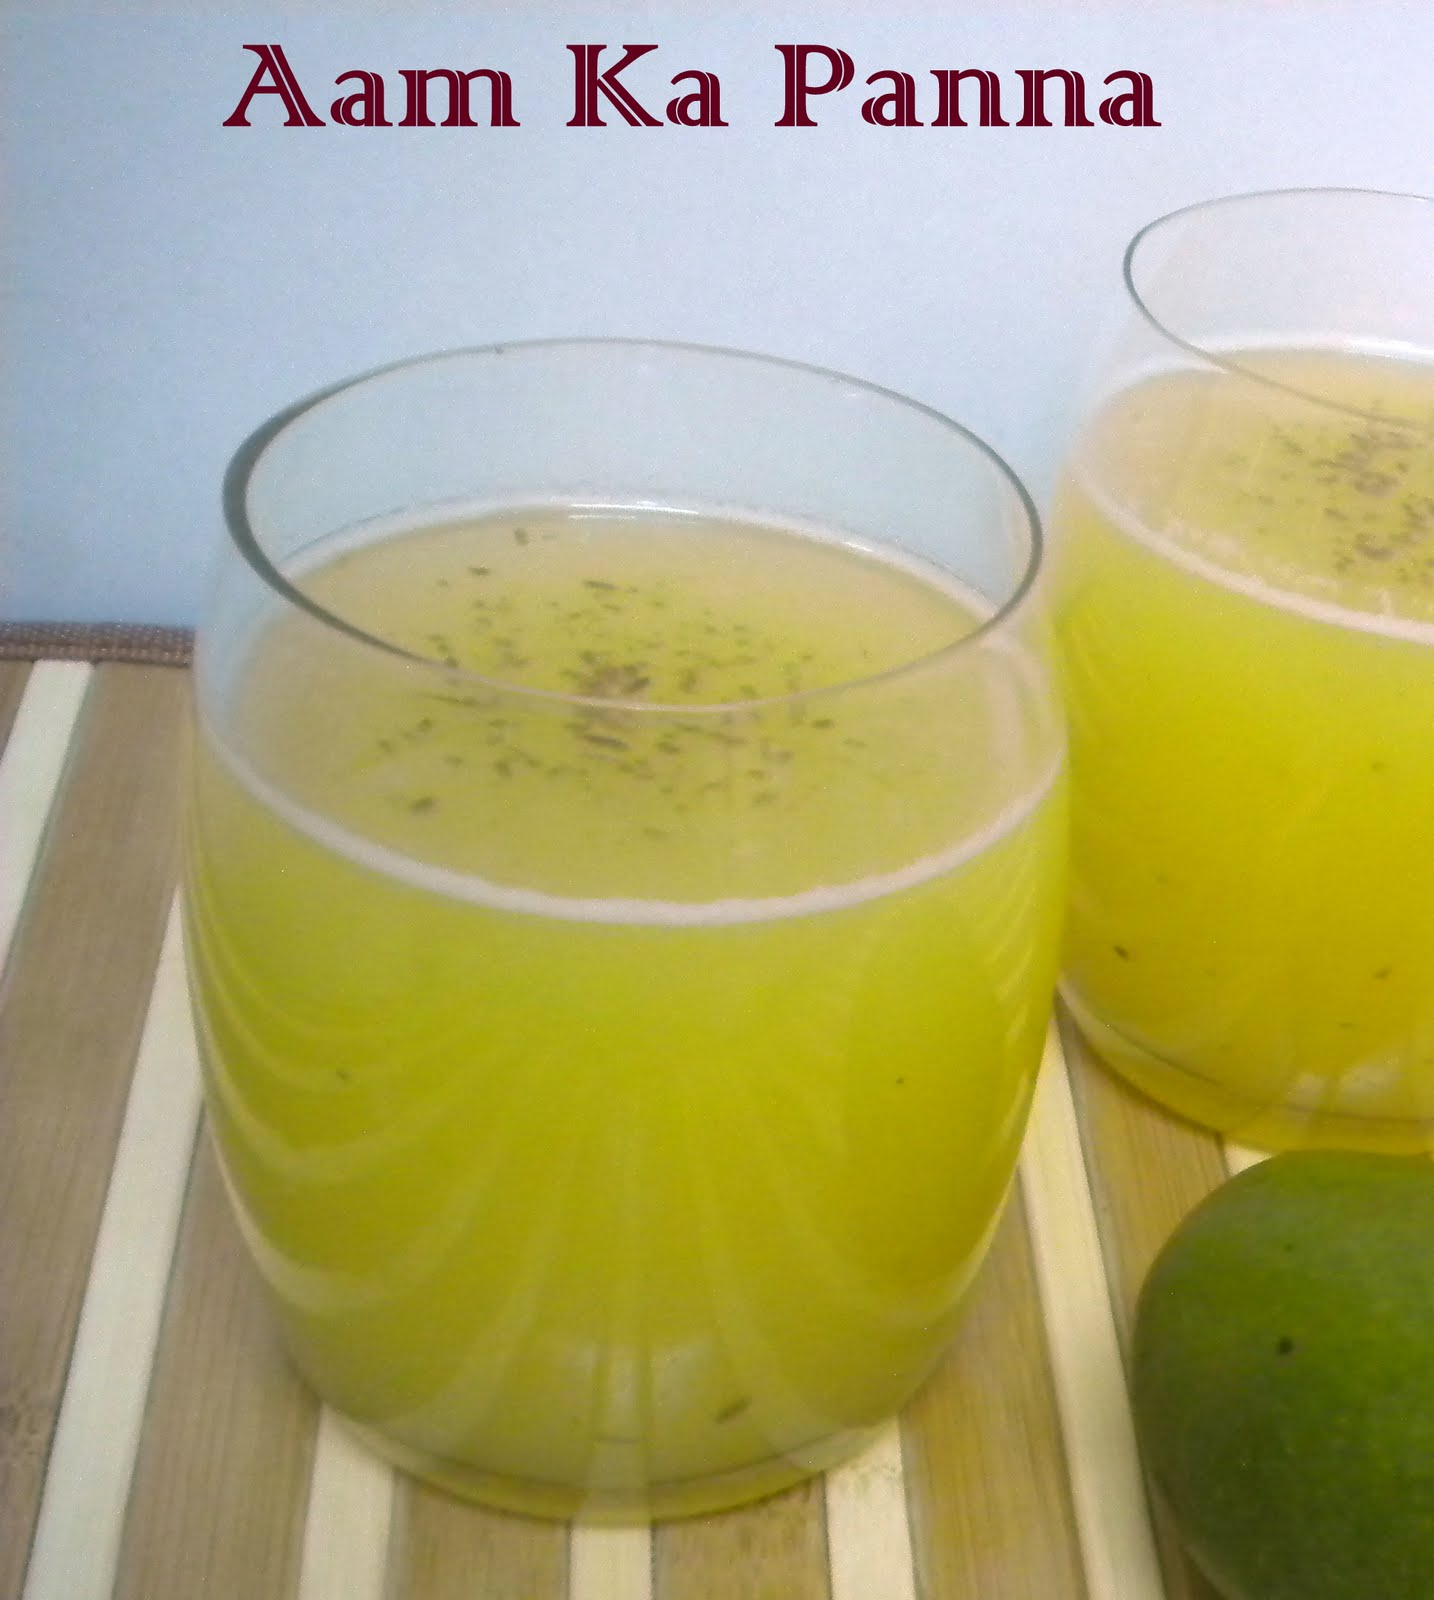 Palakkad Chamayal: Aam Ka Panna